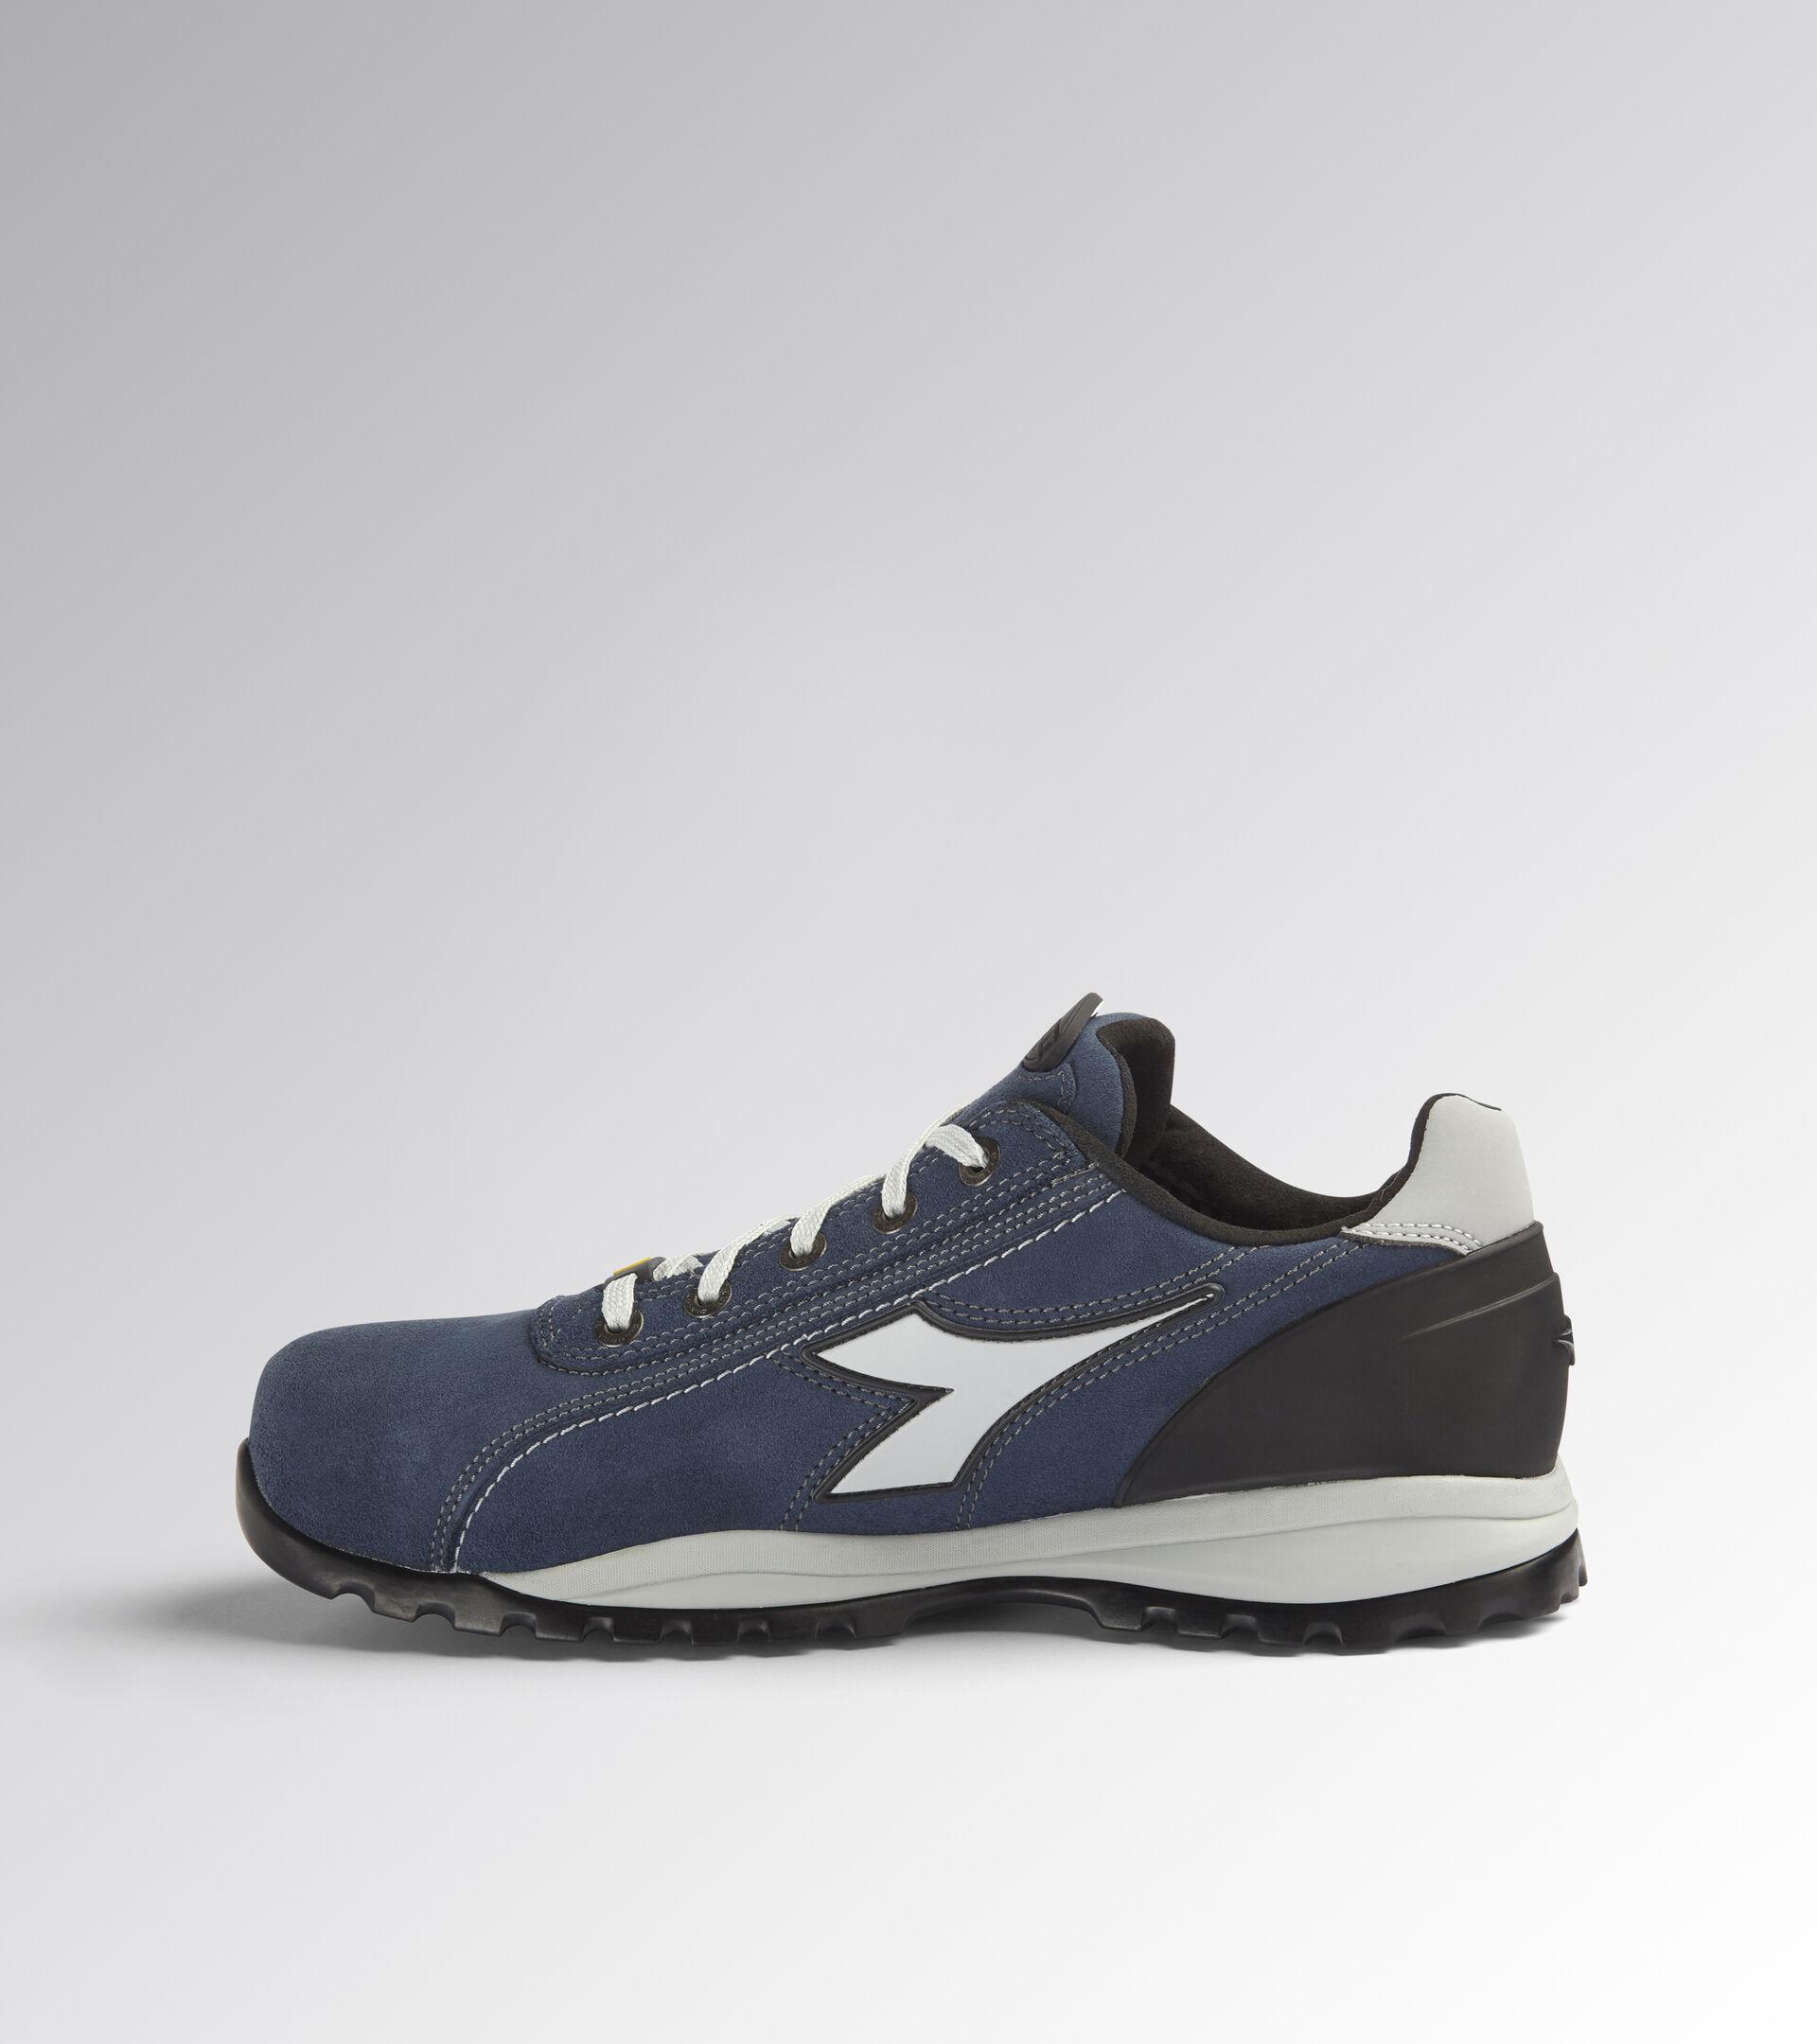 Footwear Utility UNISEX GLOVE NET LOW S3 HRO SRA ESD BLAU TIEFES Utility